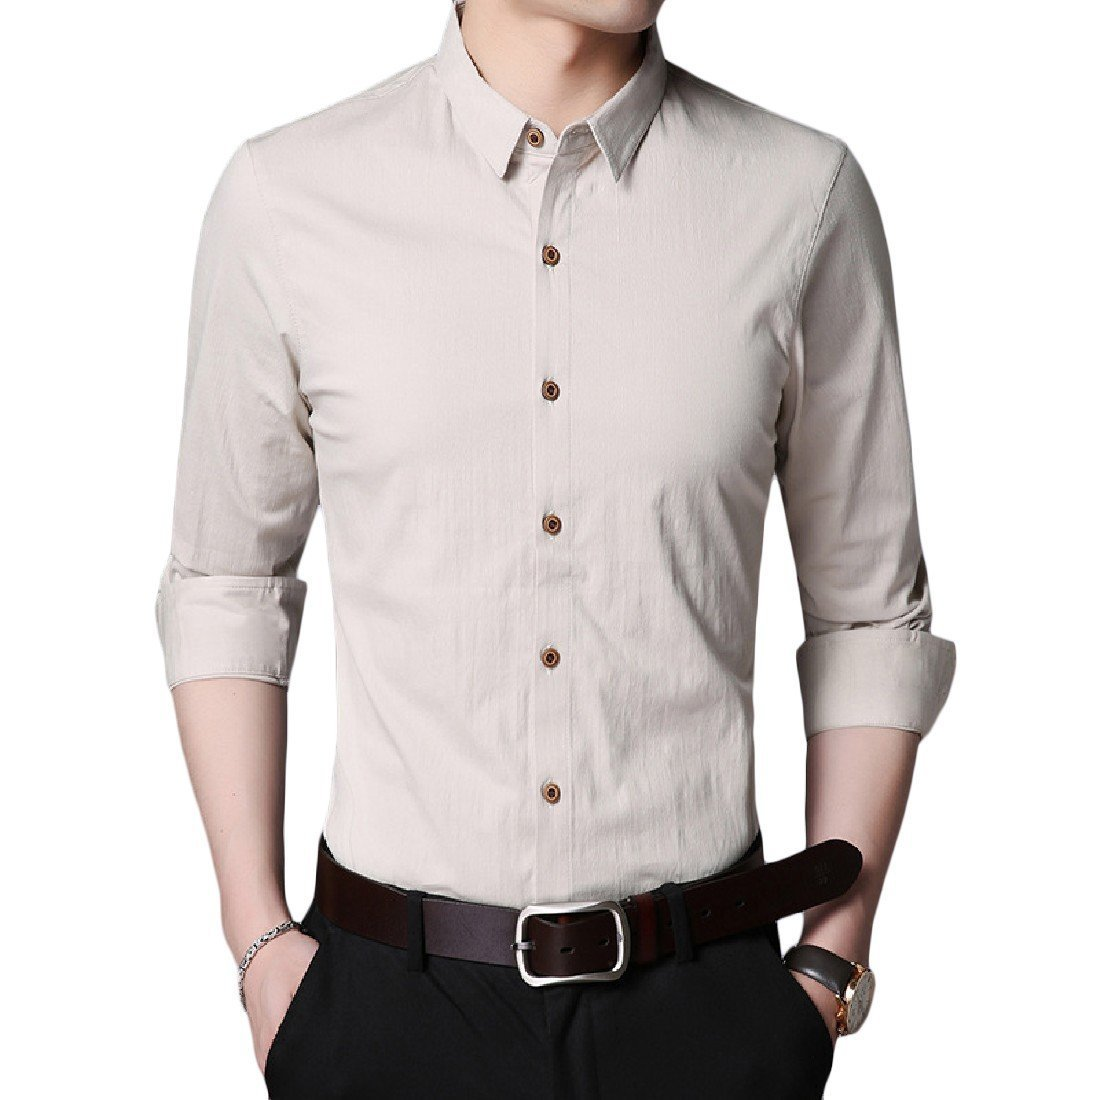 YUNY Mens Turn Down Collar Business Long Sleeve Button Down Shirt Khaki L